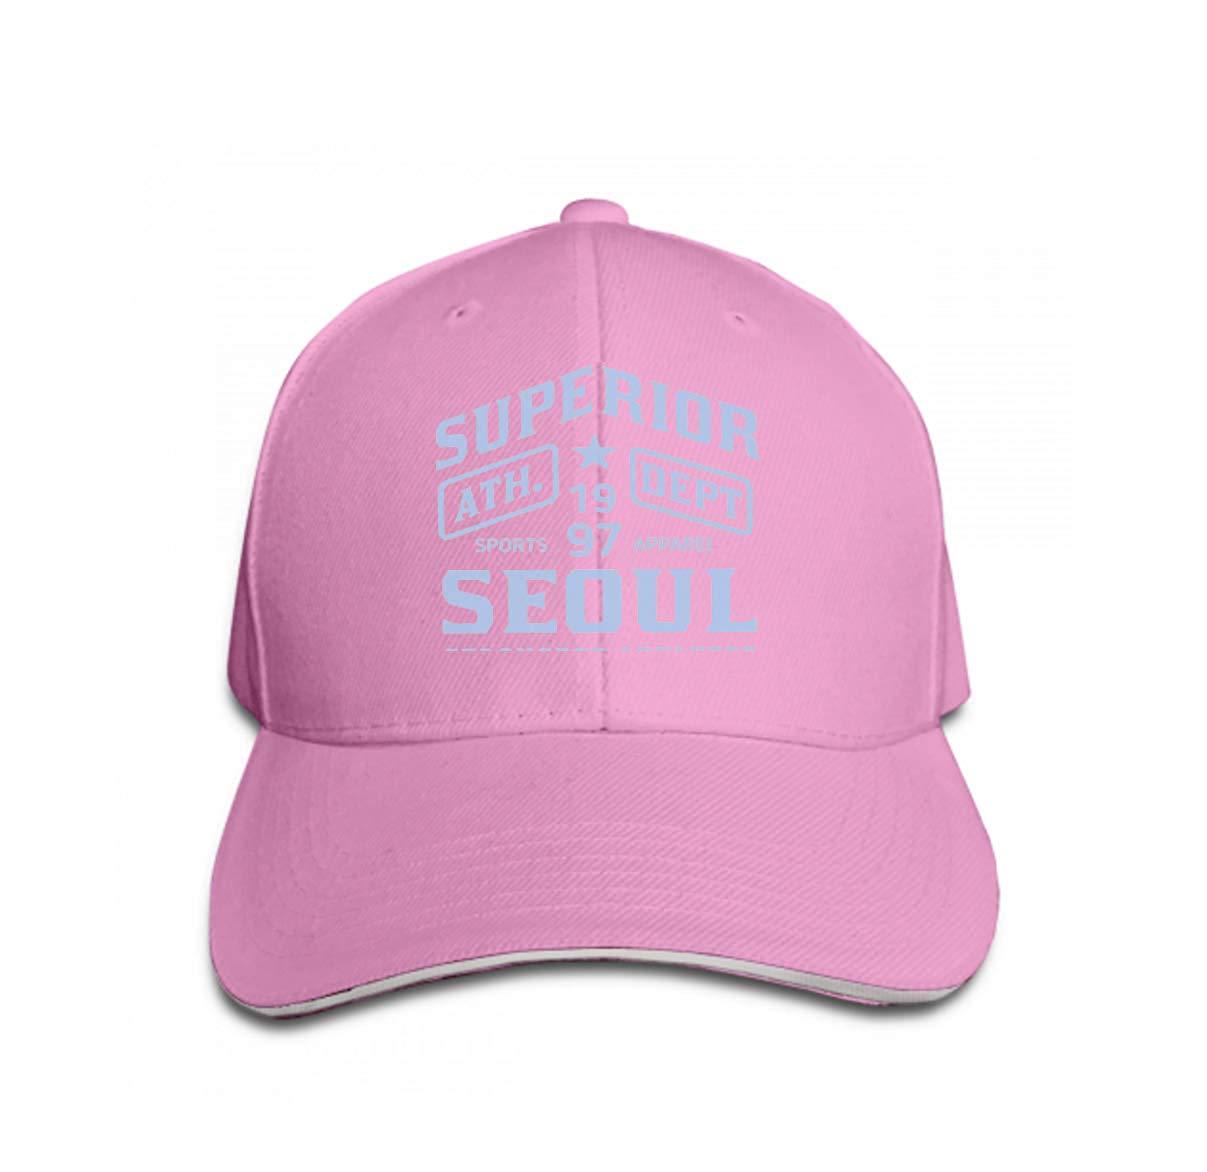 Unisex Baseball Caps Adjustable Plain Dad Hat Sun Cap Seoul Sport Design College Team Style Typography Poster Print